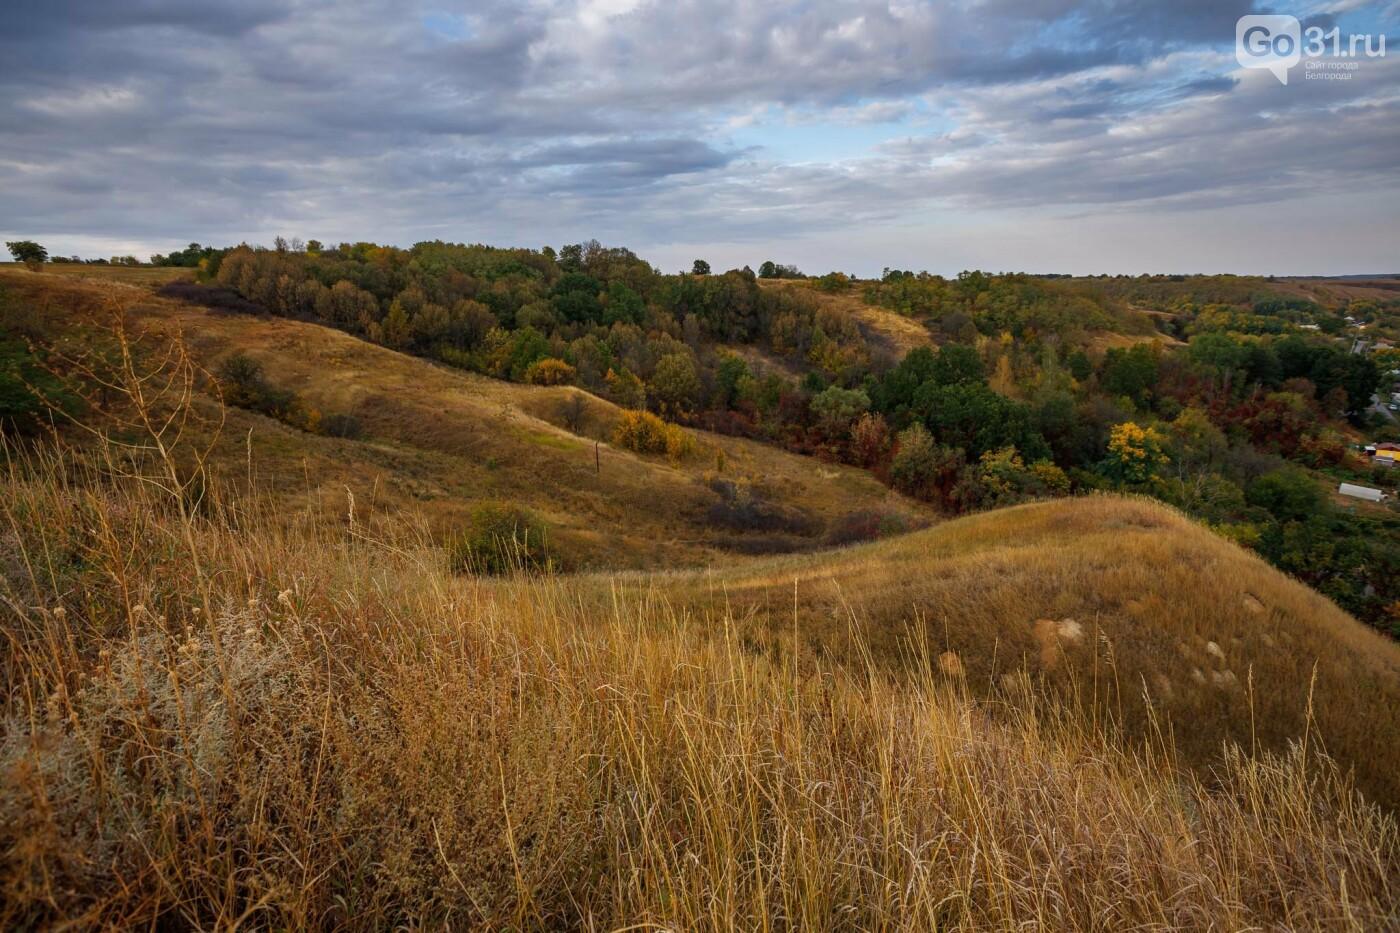 Хотмыжск – по-осеннему. Фоторепортаж, фото-16, Фото: Антон Вергун